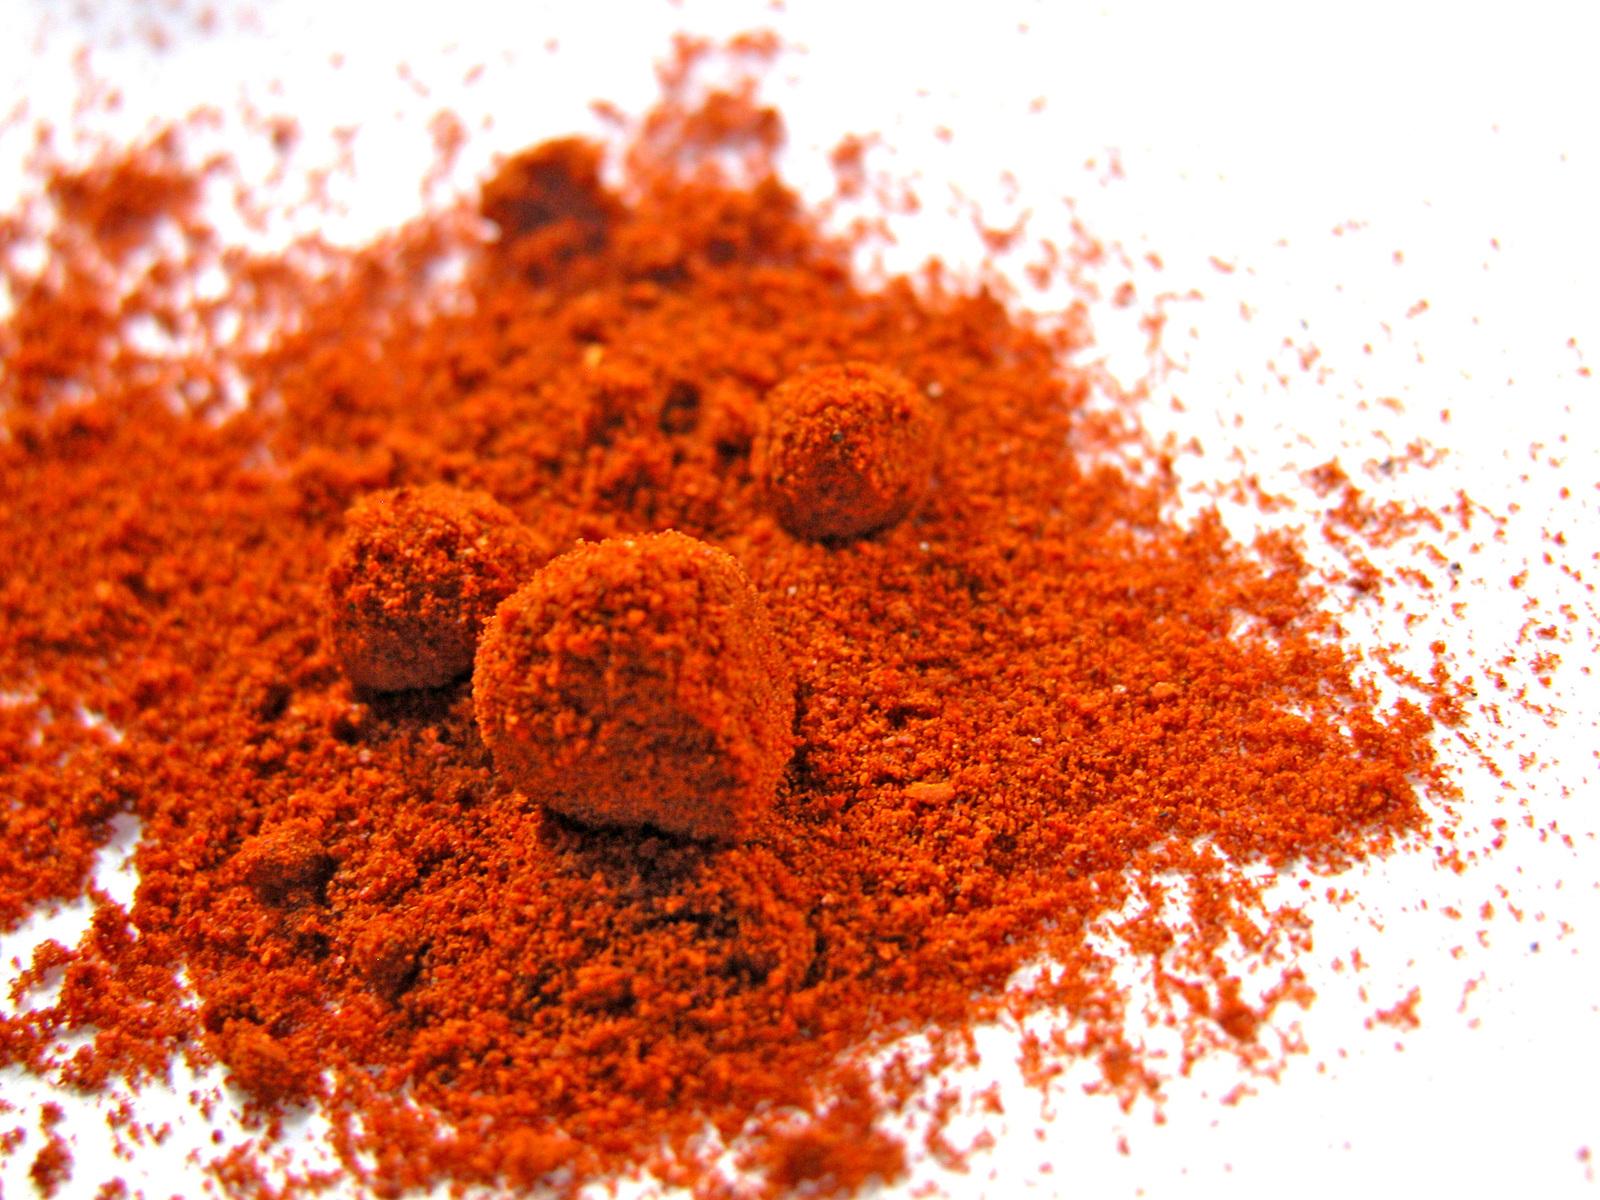 Zdroj: FreeImages.com/tijmen van dobbenburgh